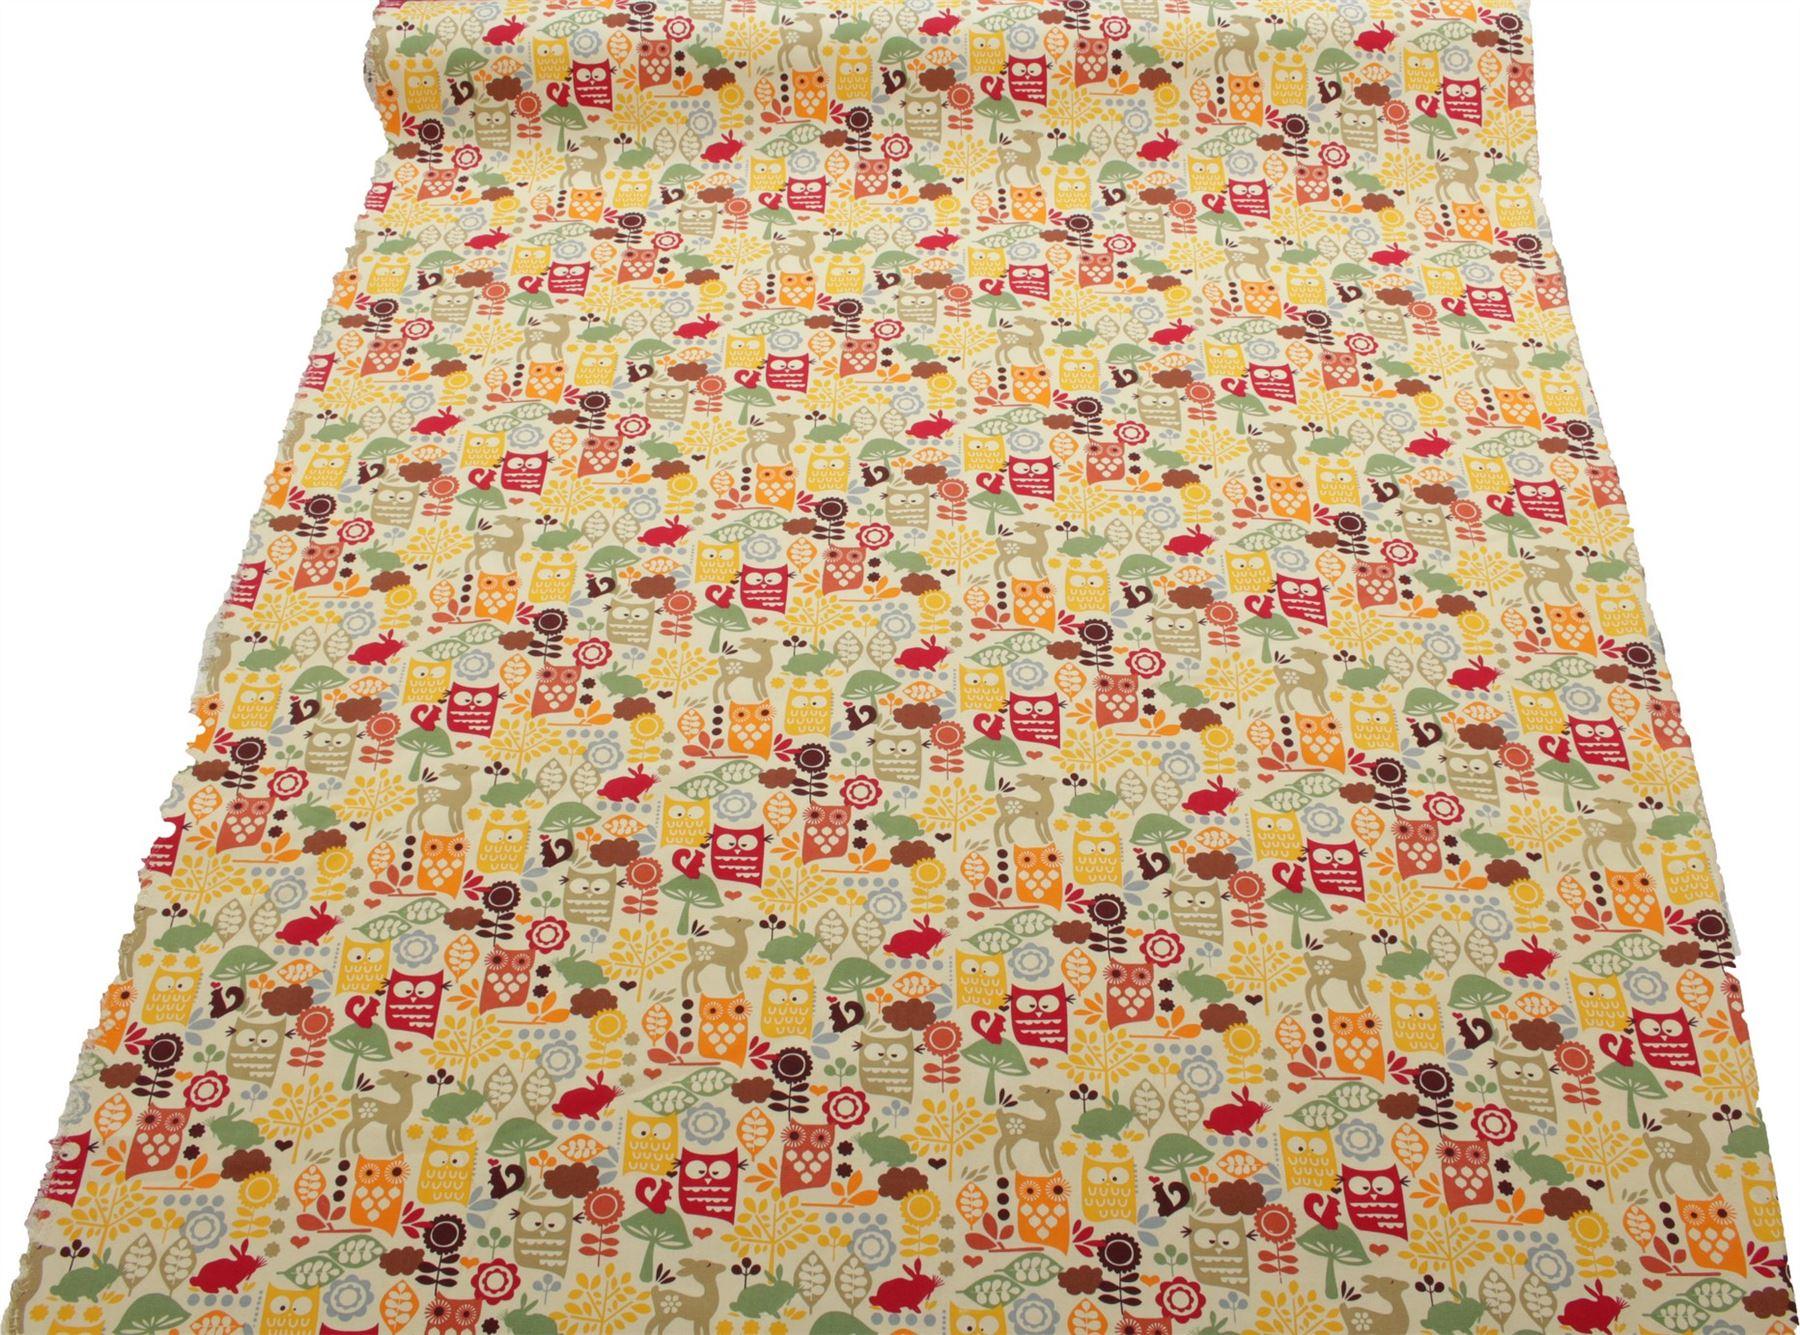 thumbnail 61 - 100% Heavy Cotton Panama Printed Childrens Curtain Cushion Upholstery Fabric